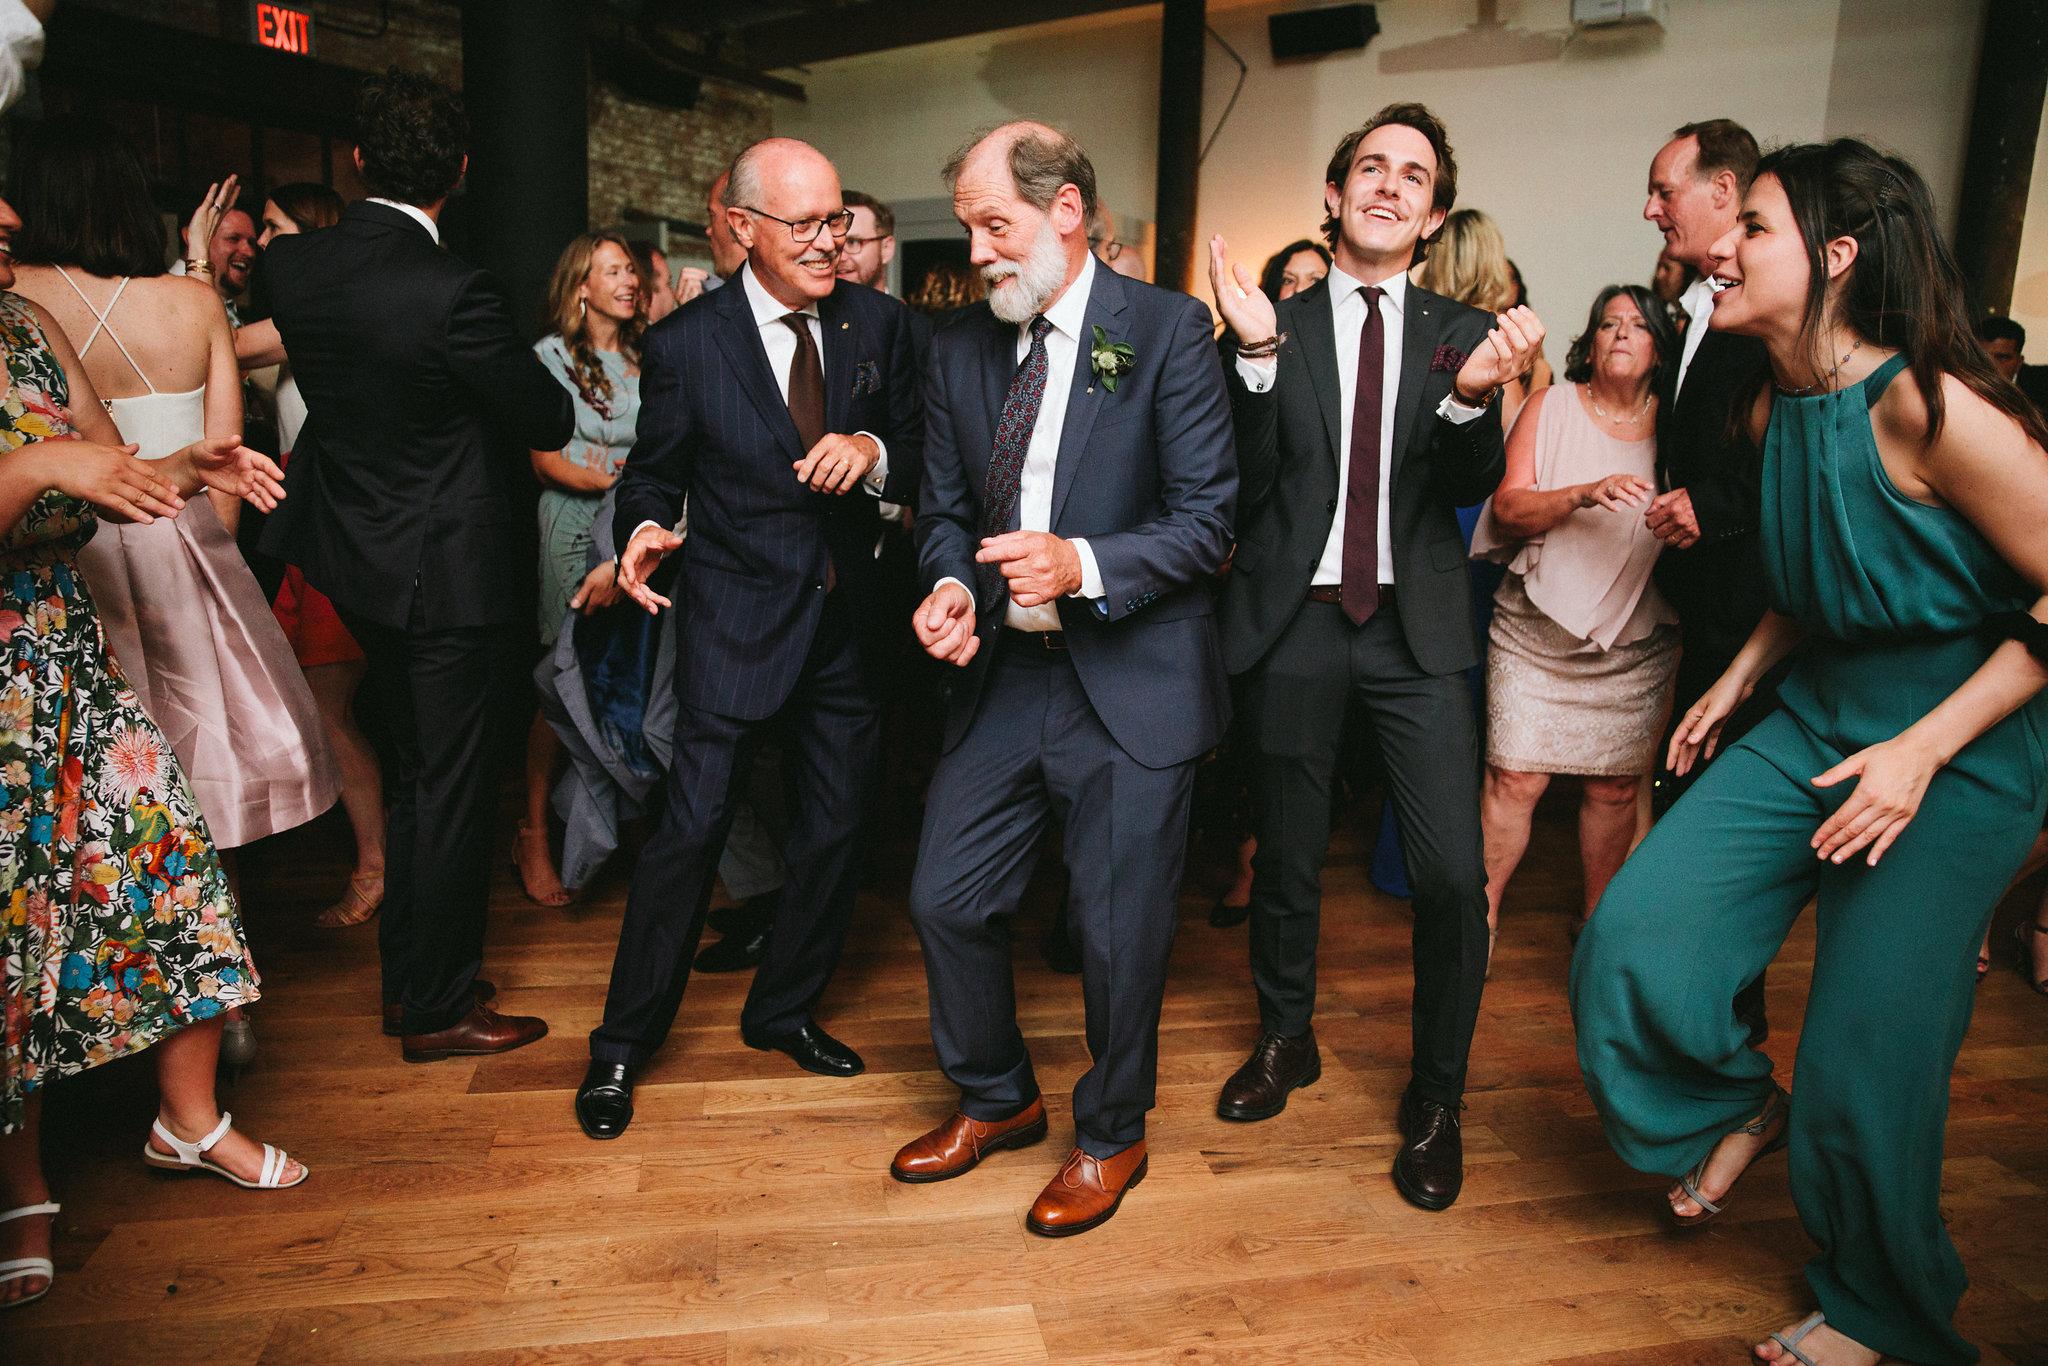 S+M-wythe-wedding-jove-meyer-events-0154.jpg